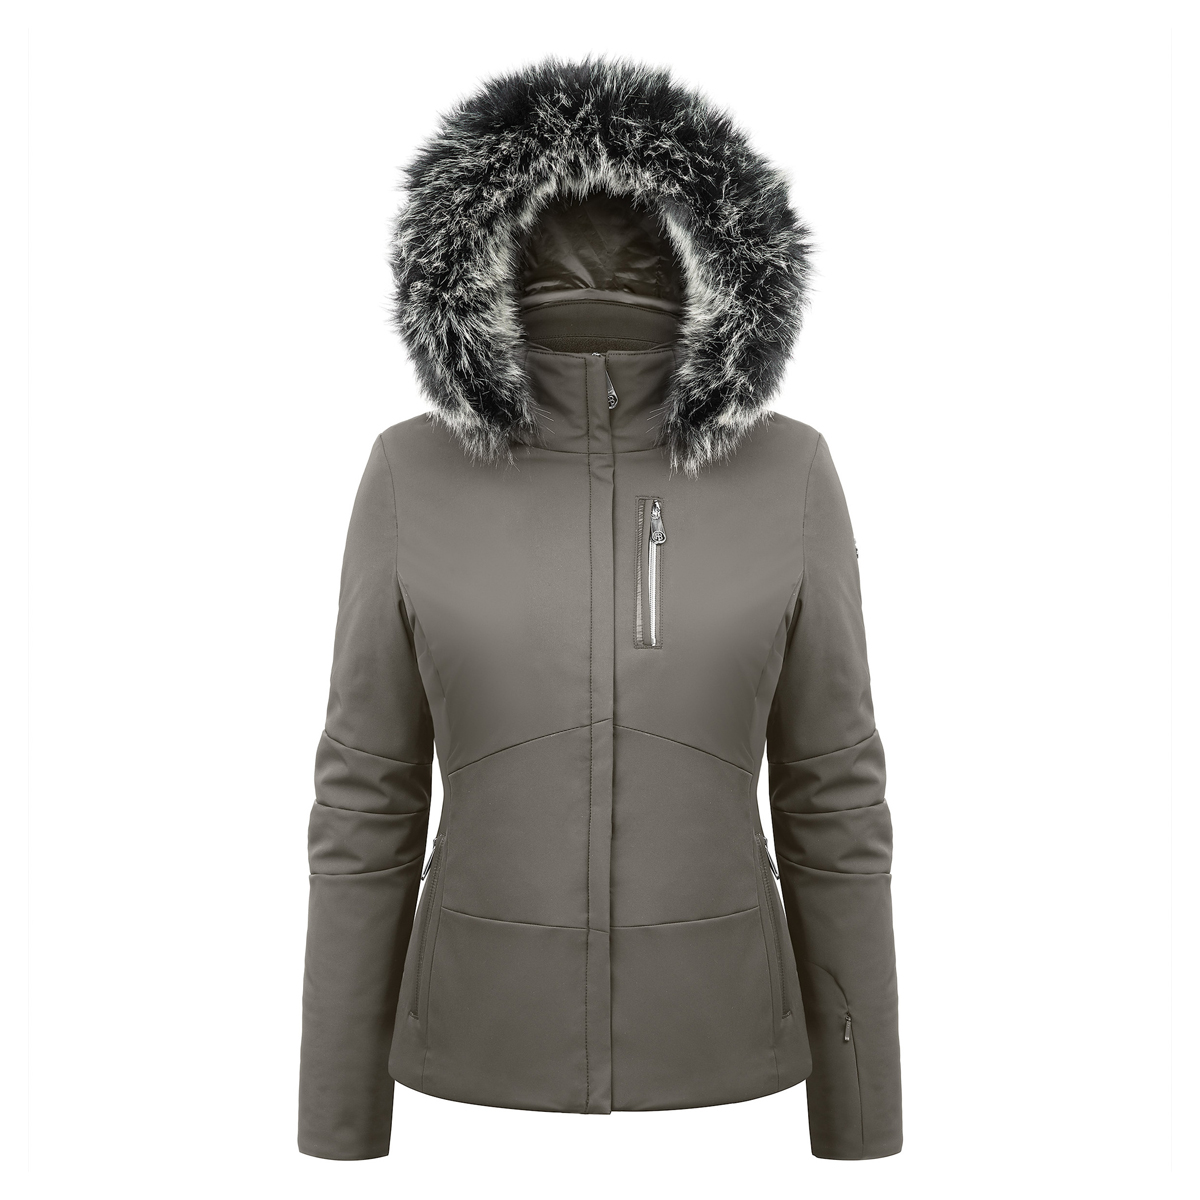 3c1eeee53b Poivre Blanc Women s Stretch Ski Jackets with Faux Fur Trim 18 ...